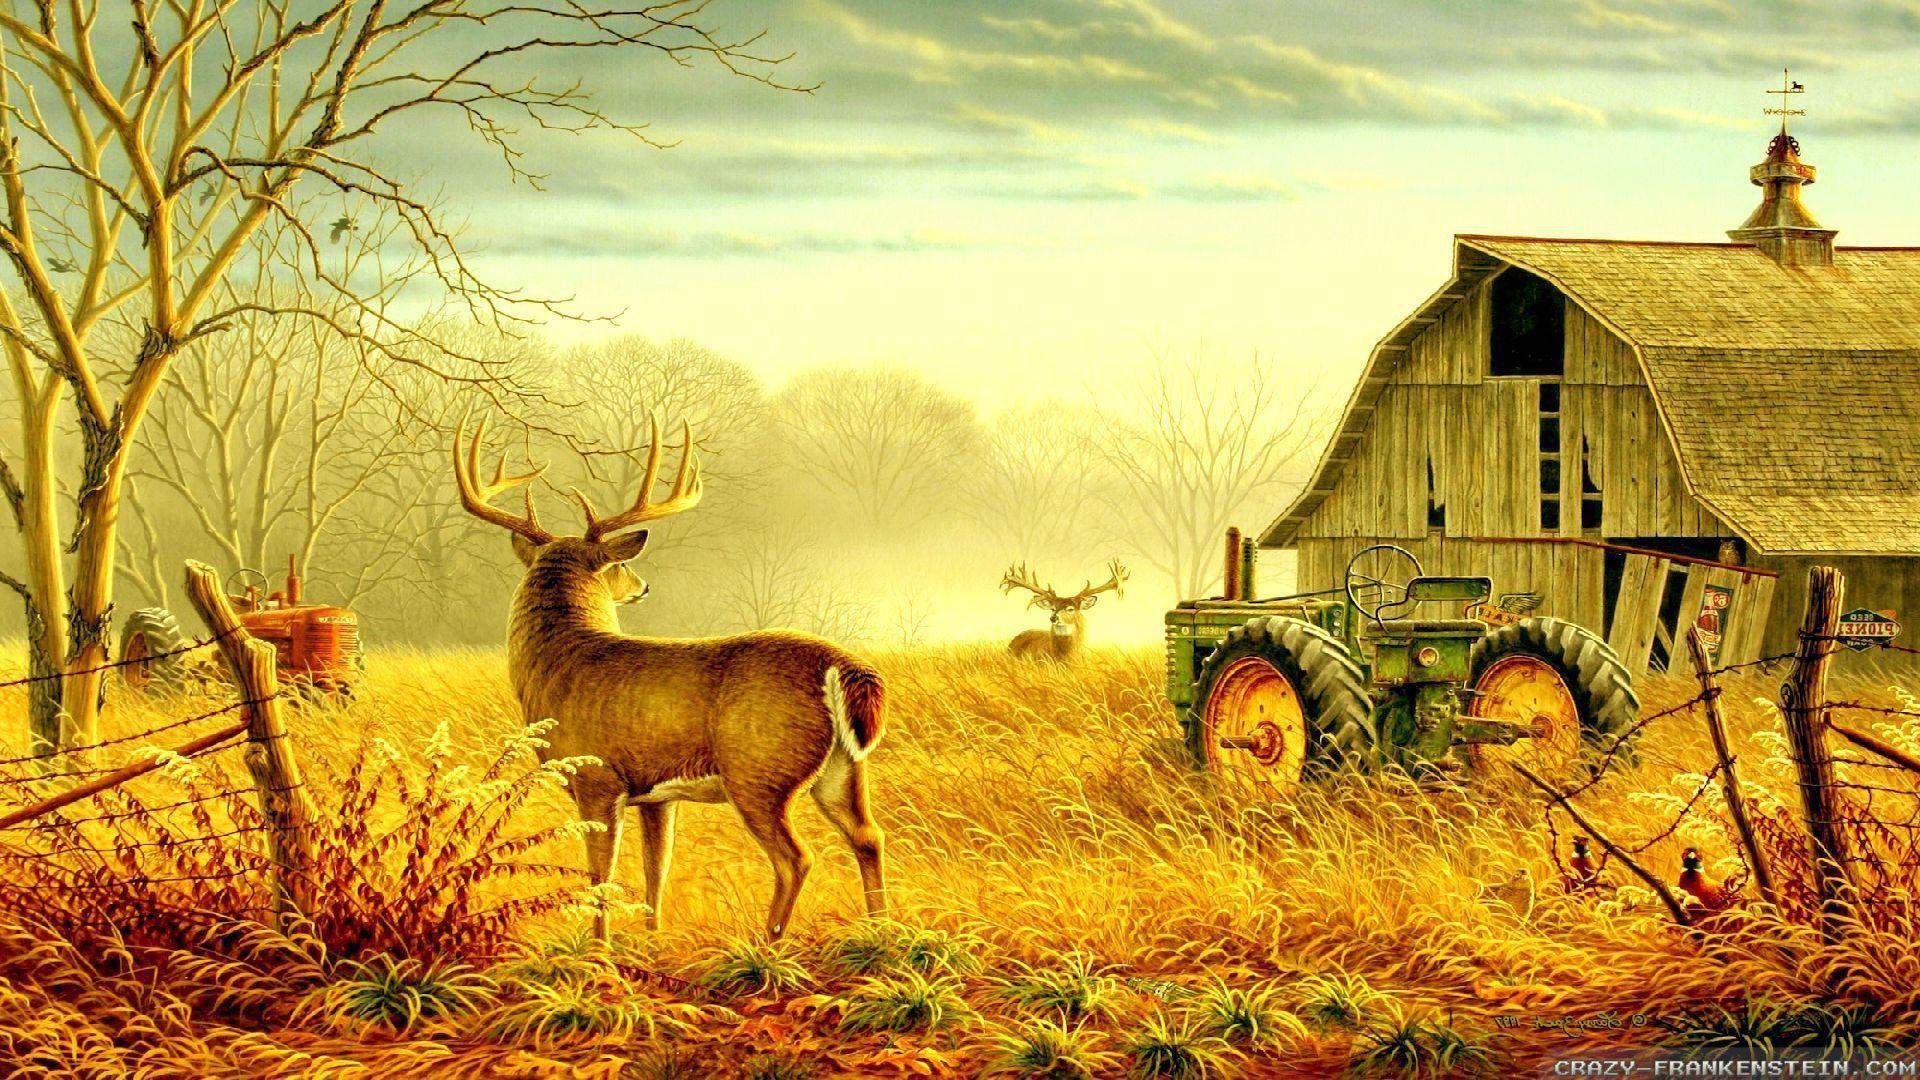 Rural scene wallpapers wallpapertag - Winter farm scenes wallpaper ...